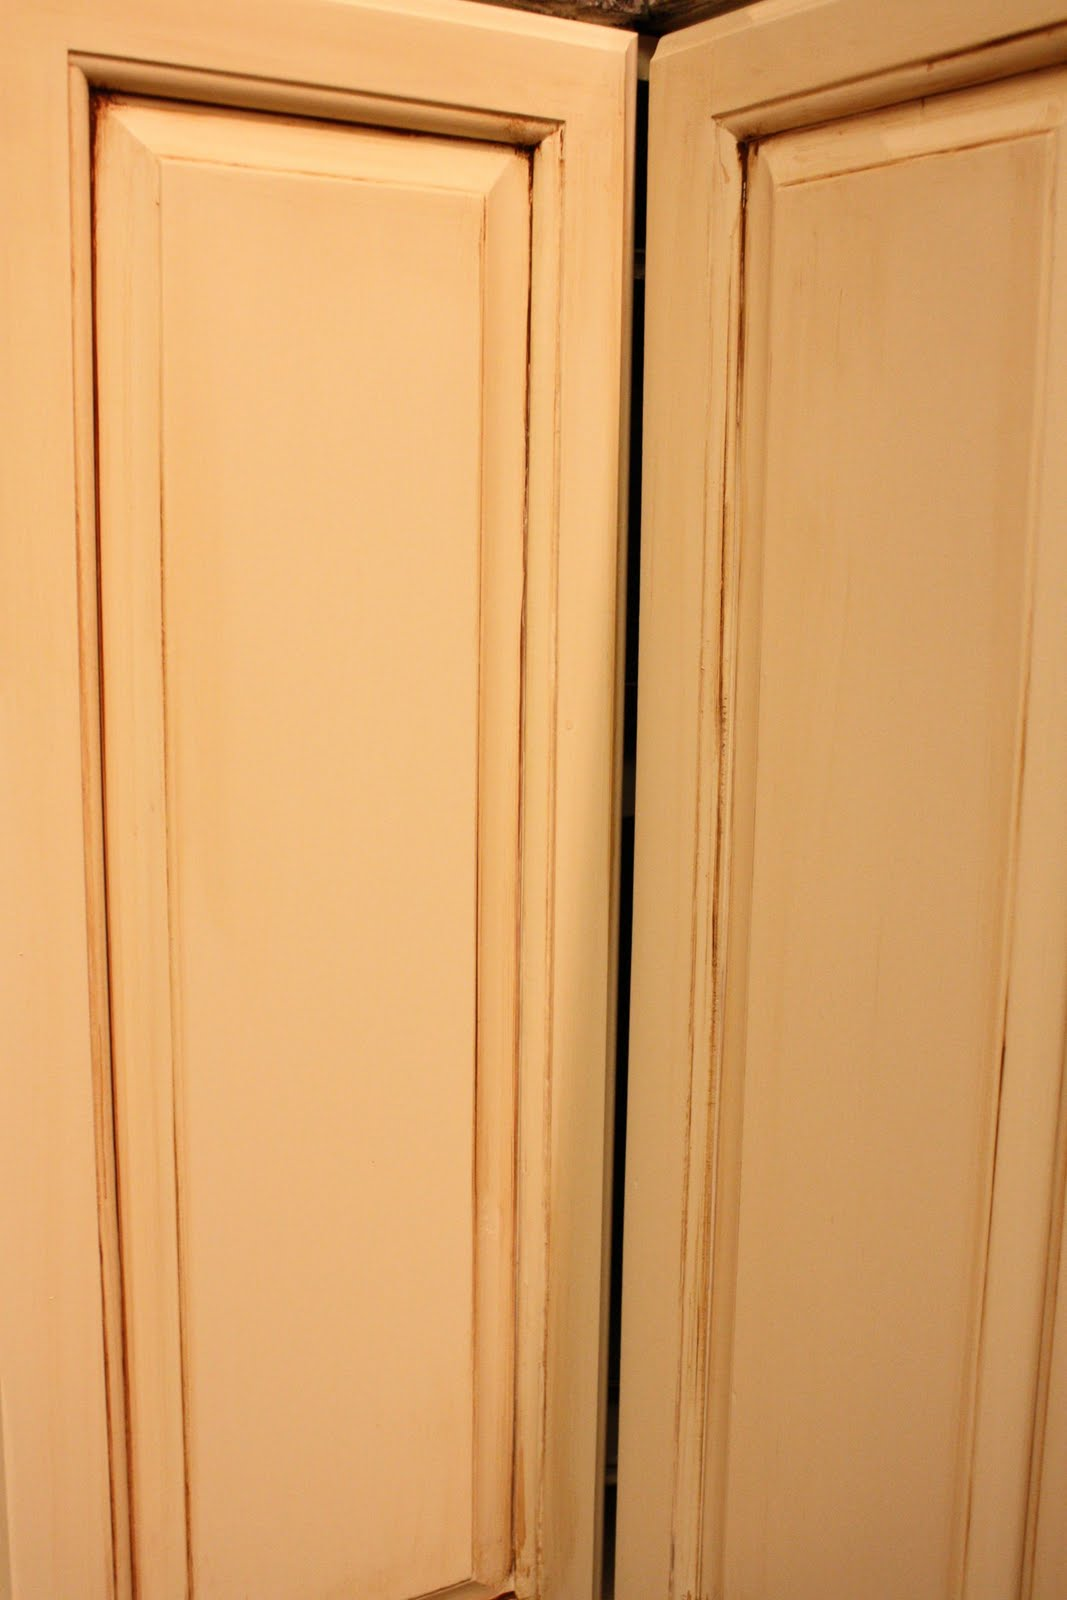 My Sweet Savannah Painted Cabinets Tutorial Amp A Winner